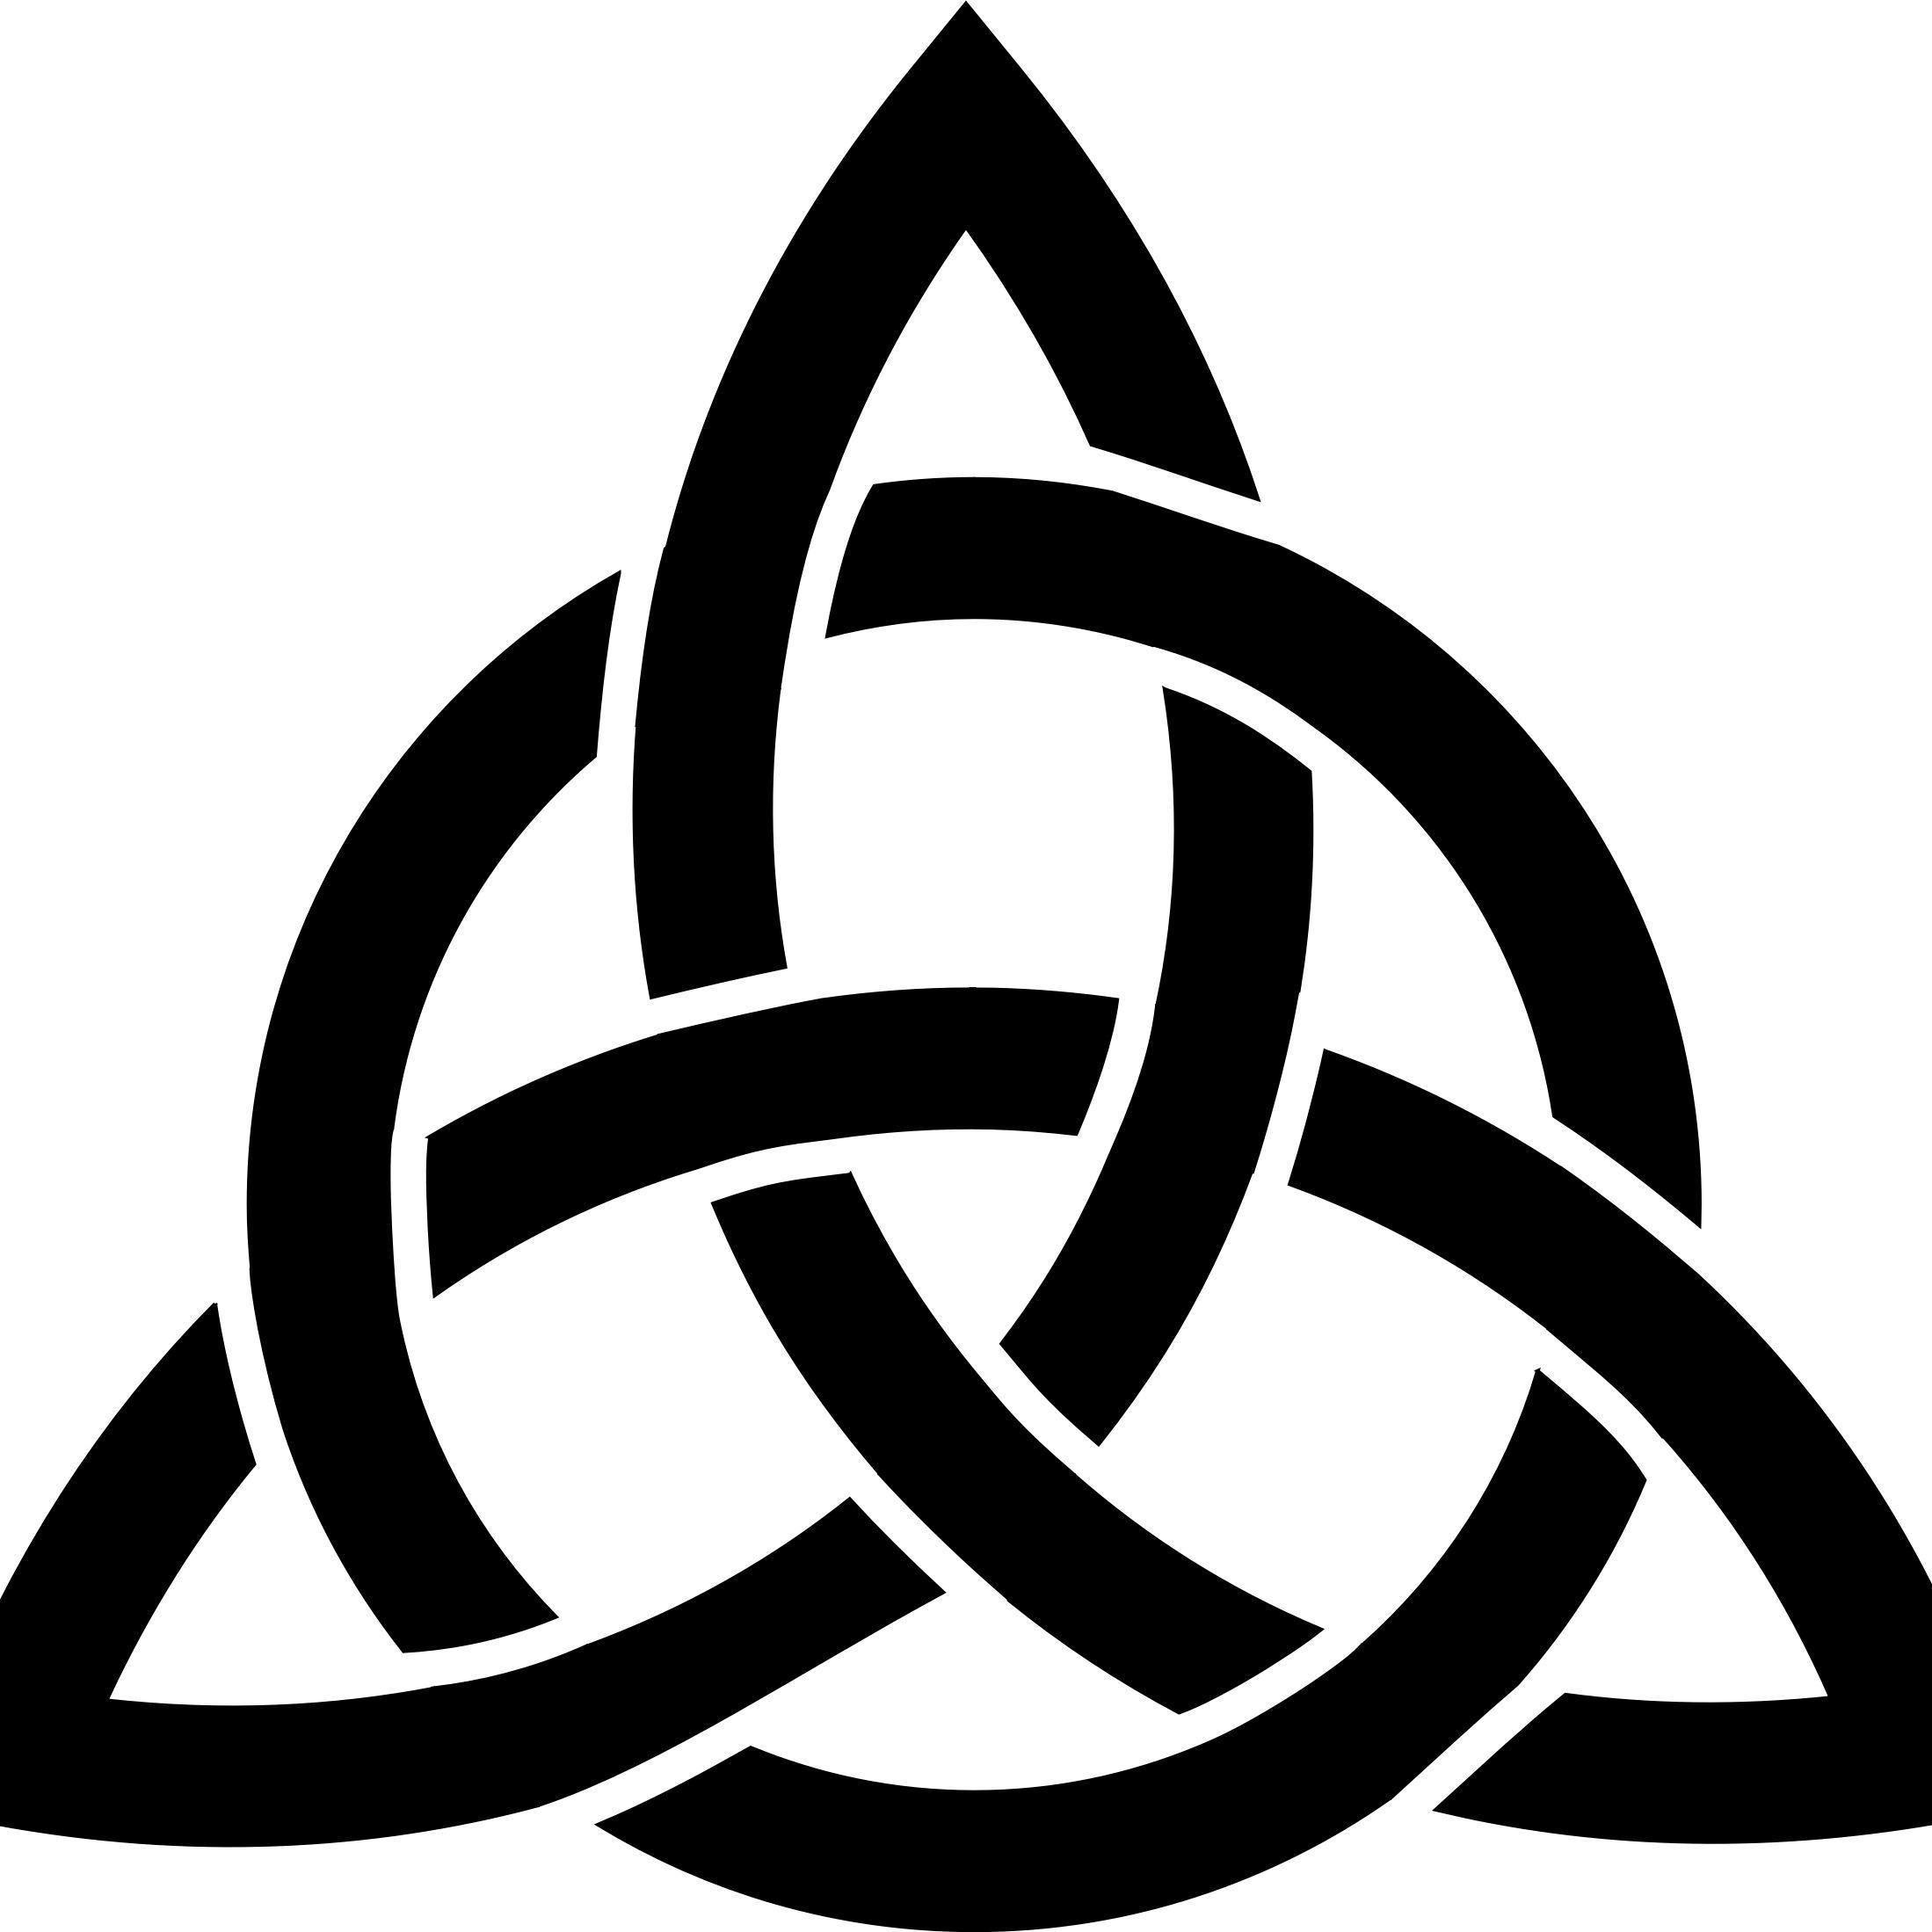 Billedresultat for trinity